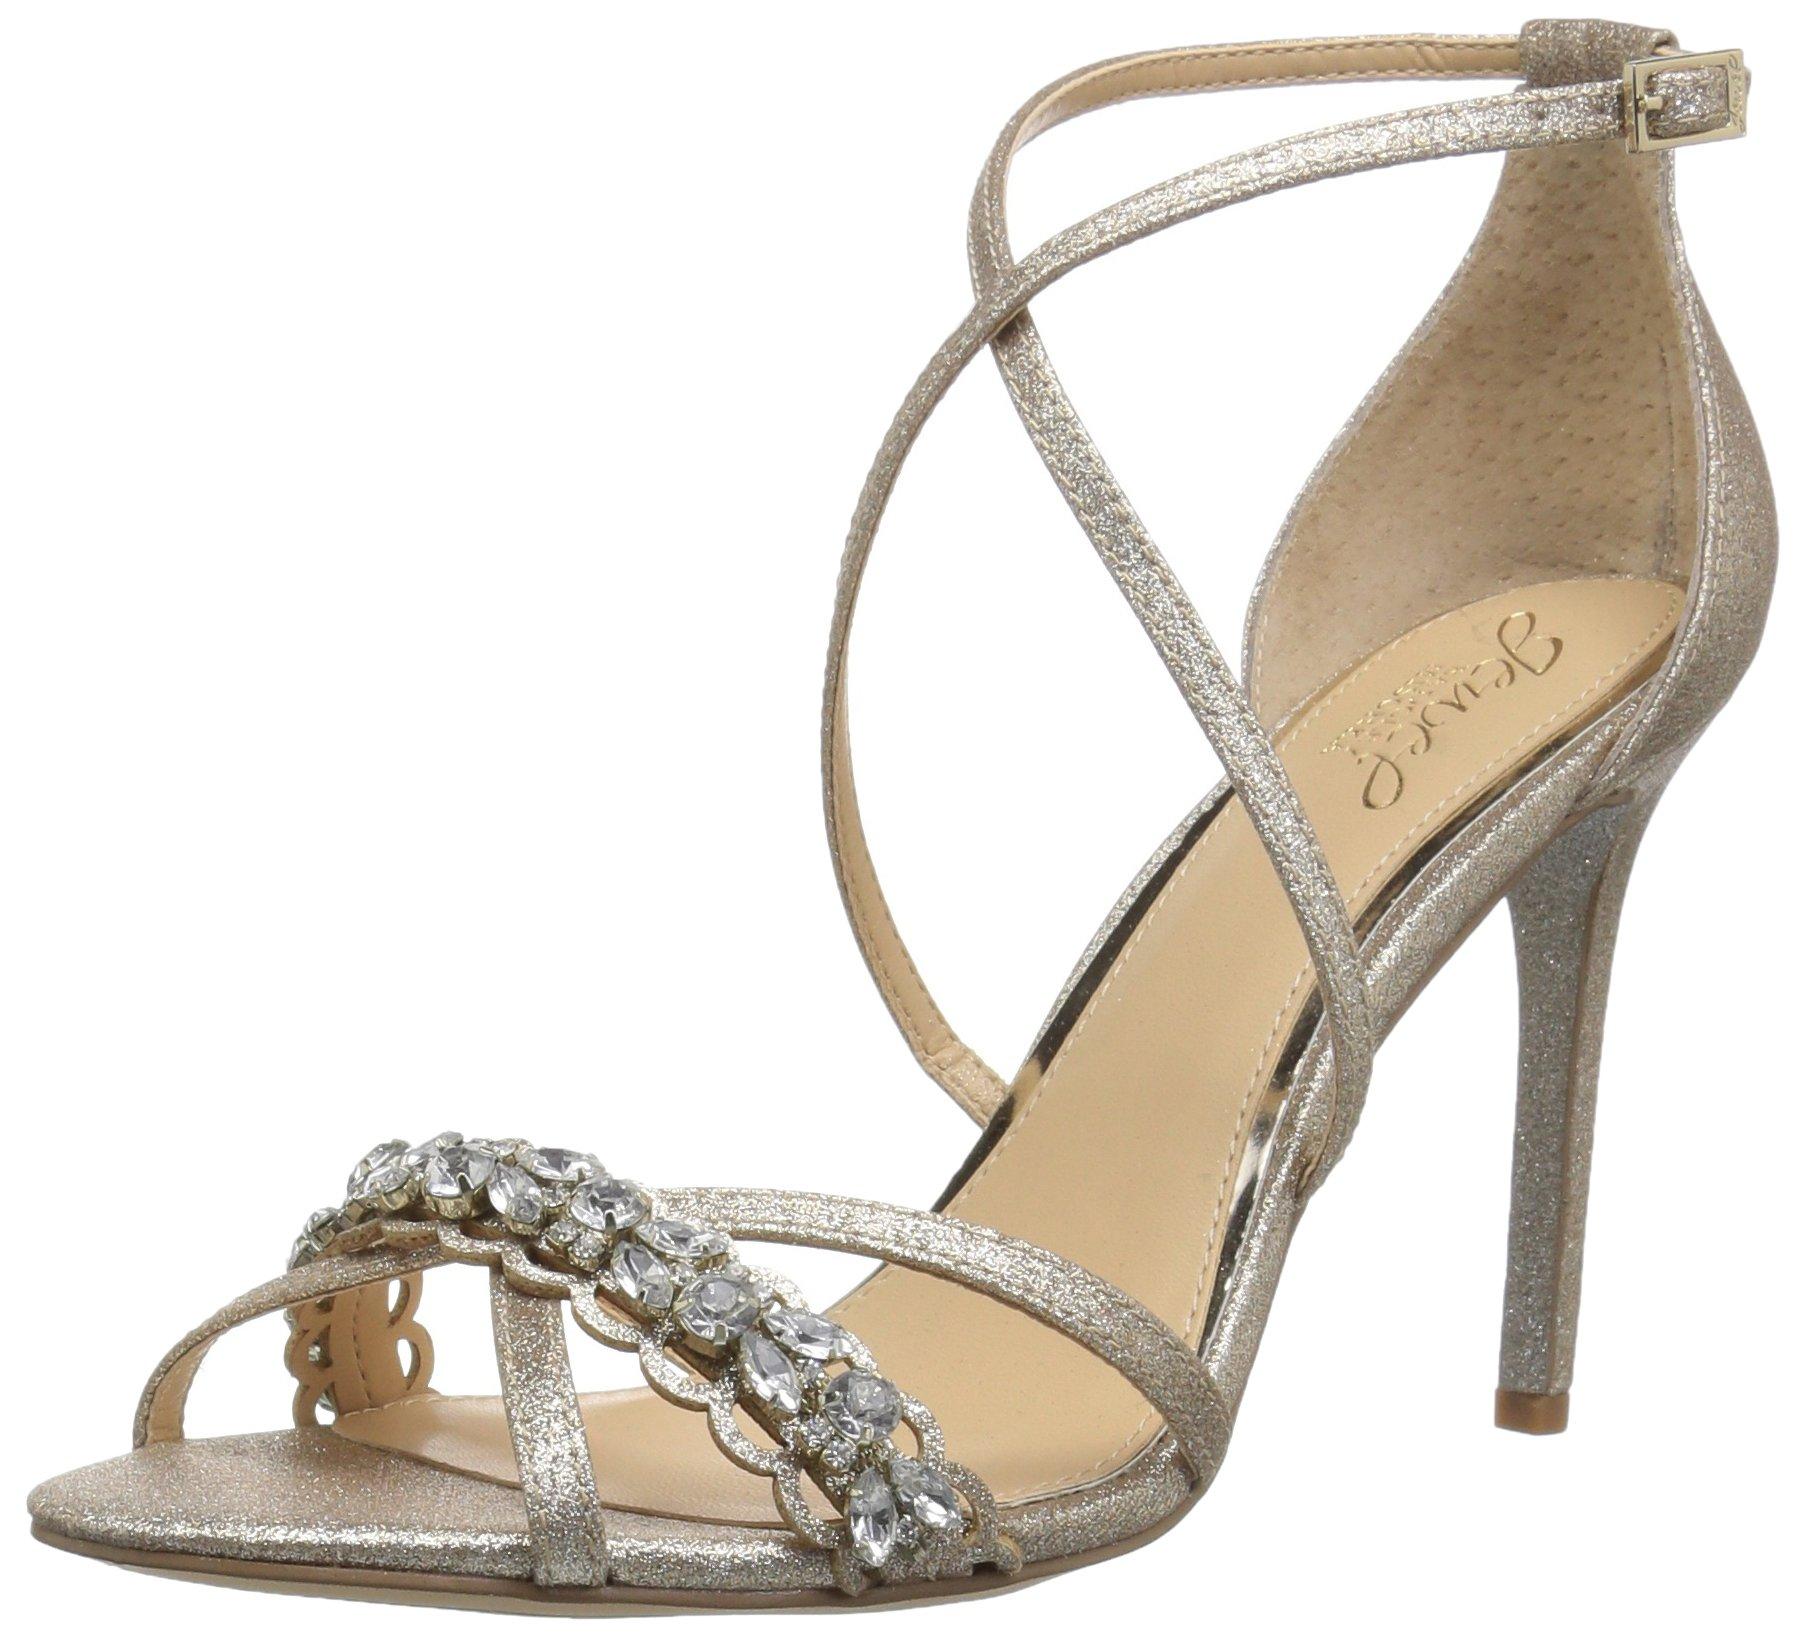 Badgley Mischka Jewel Women's Gisele Heeled Sandal, Gold, 8 Medium US